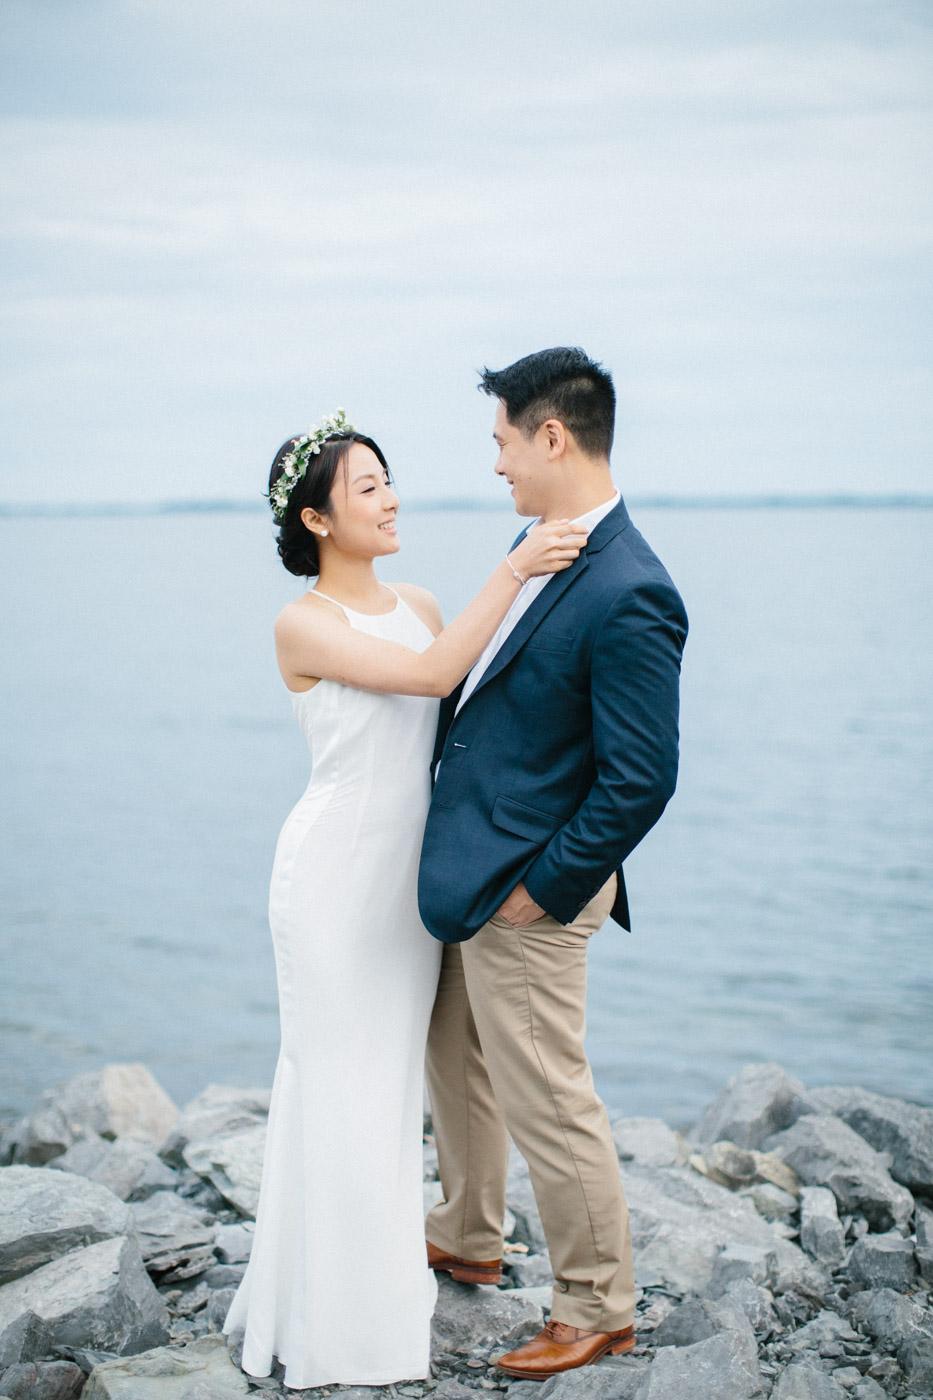 toronto_wedding_photographer_fine_art_documentary 2017-164.jpg